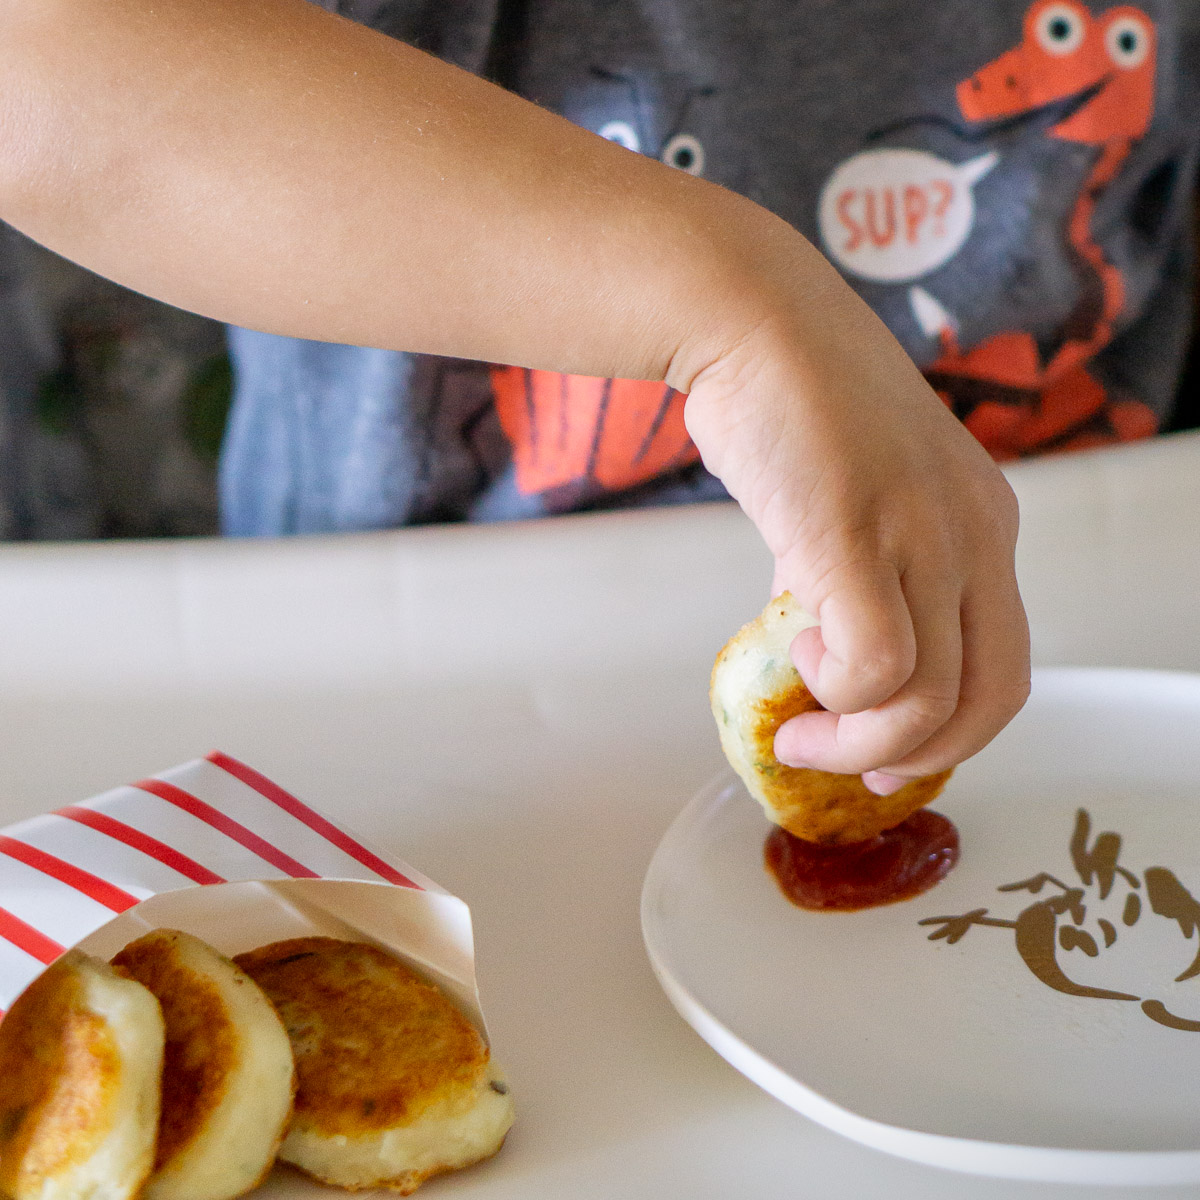 toddler dipping potato nugget in ketchup